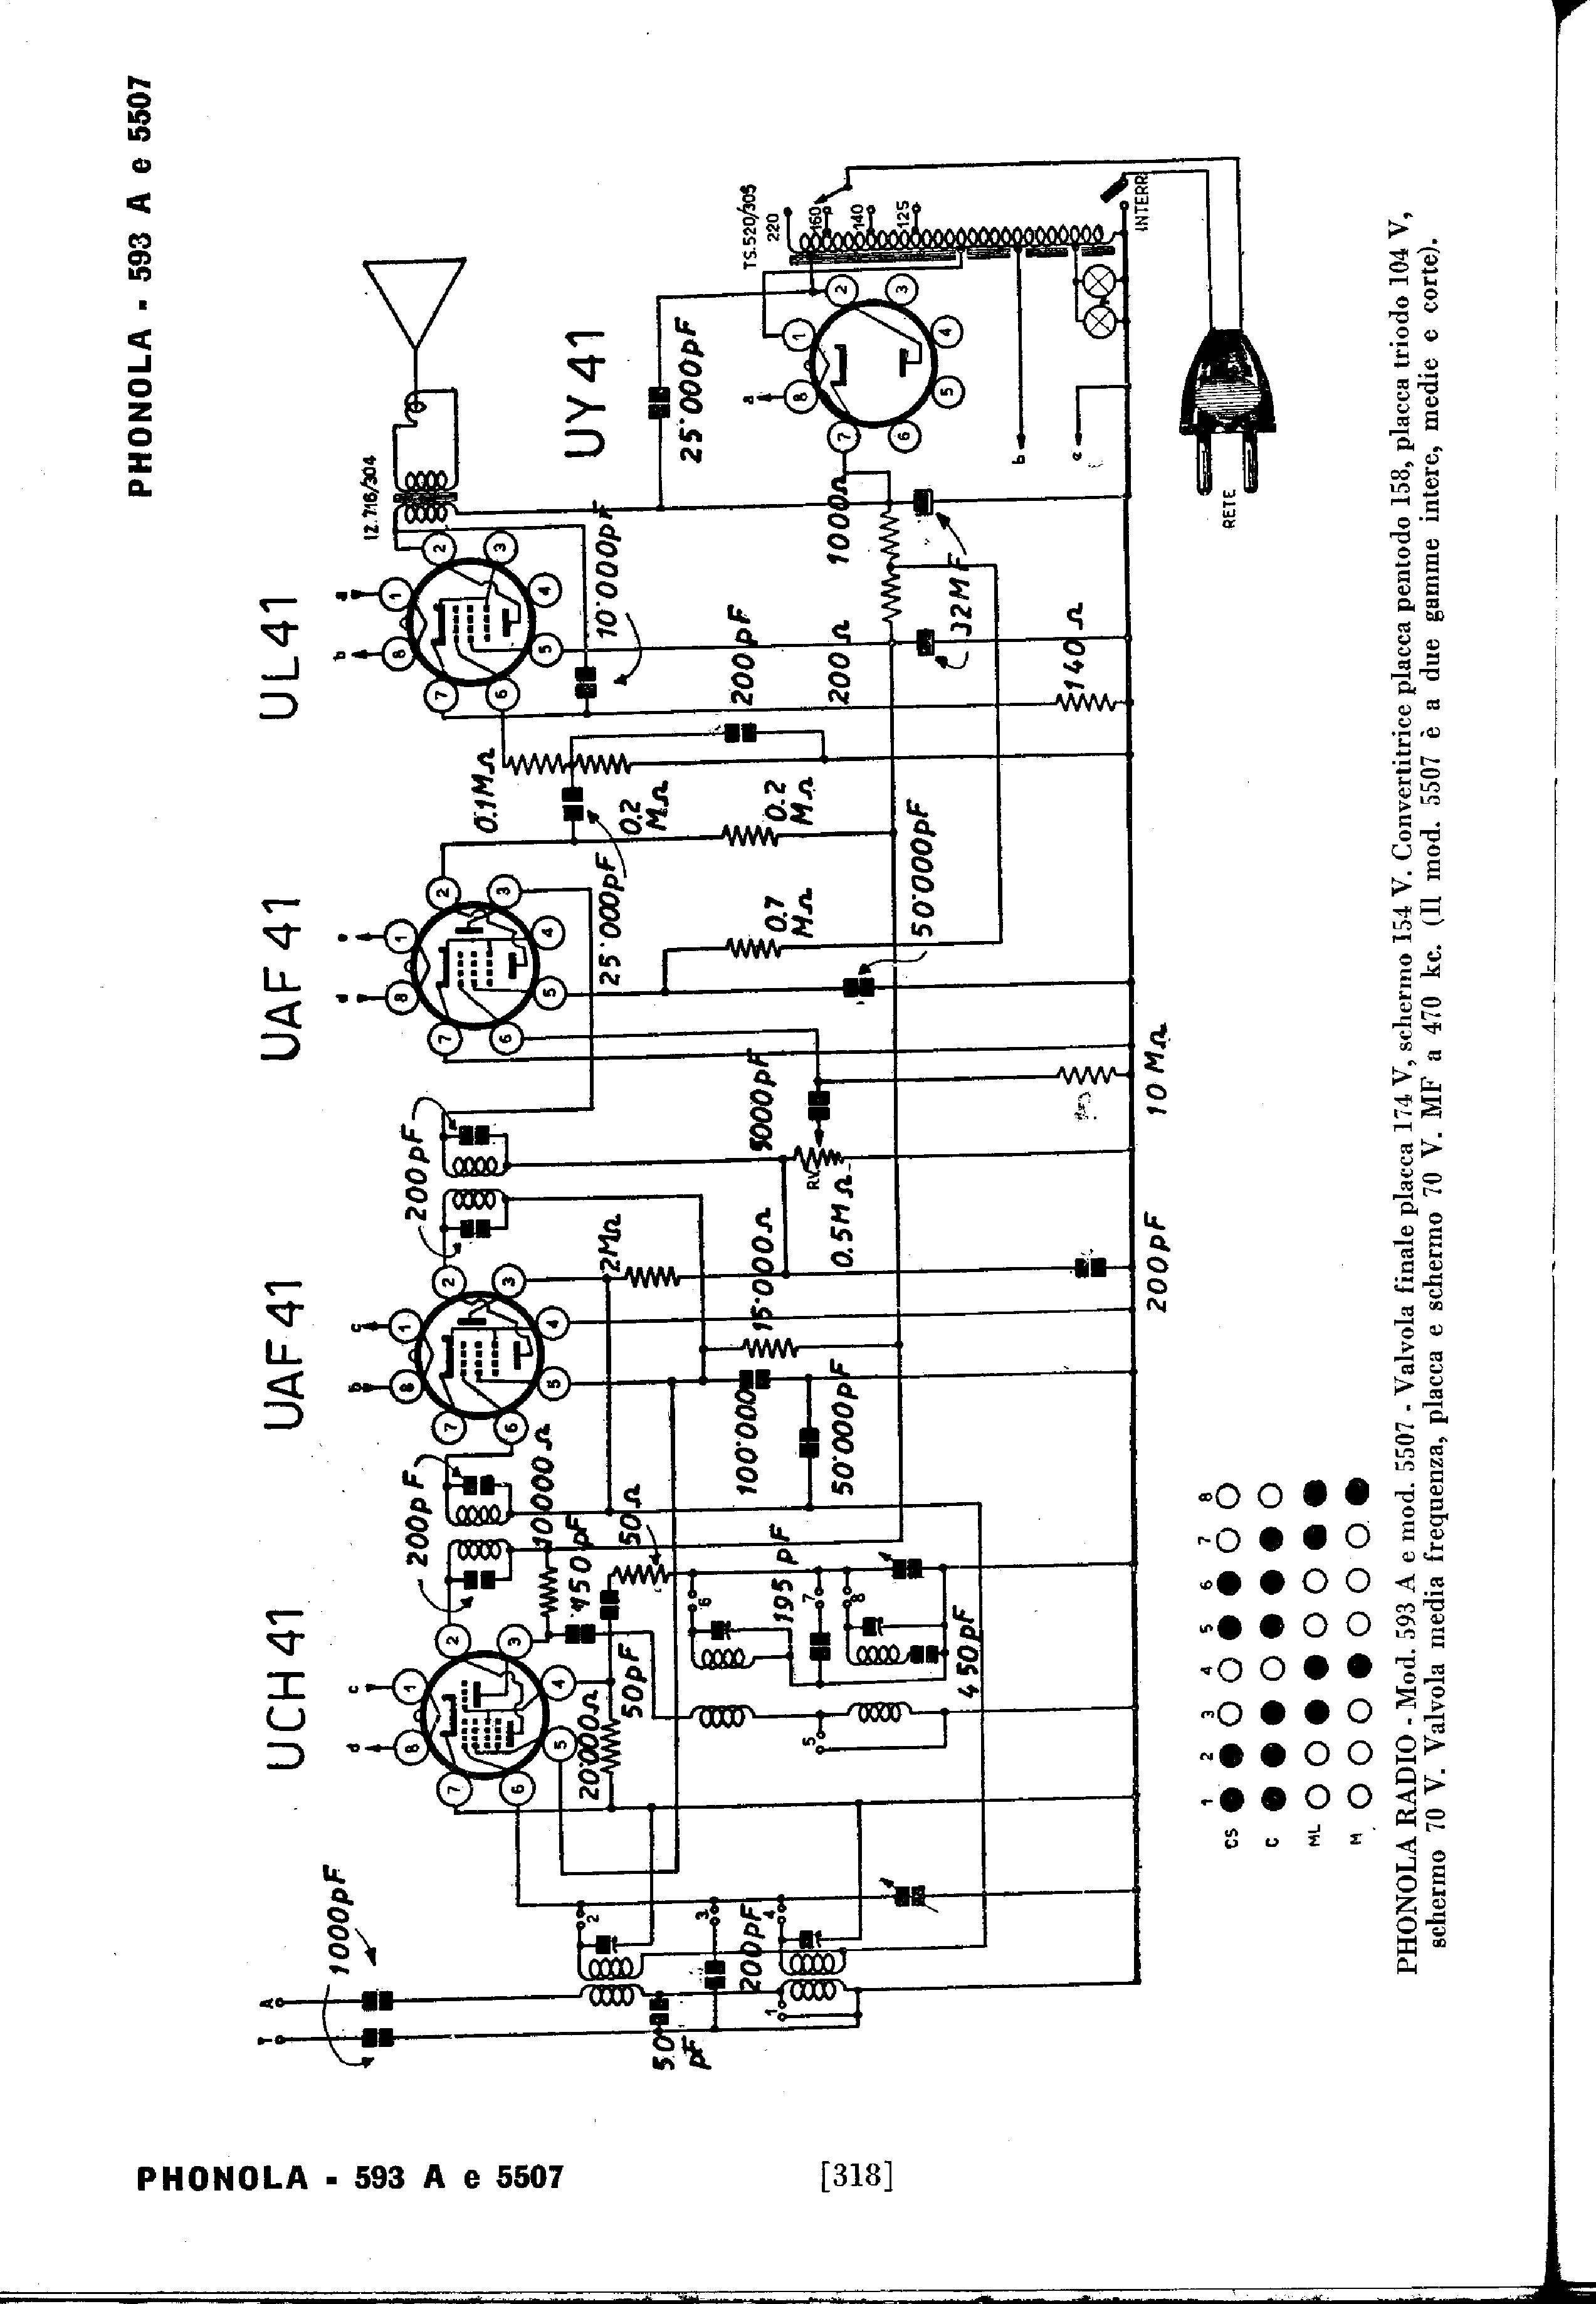 Mf 174 Manual White Rodgers Thermostat Wiring 1f56 444 Array Phonola 593a 5507 Service Download Schematics Eeprom Rh Elektrotanya Com